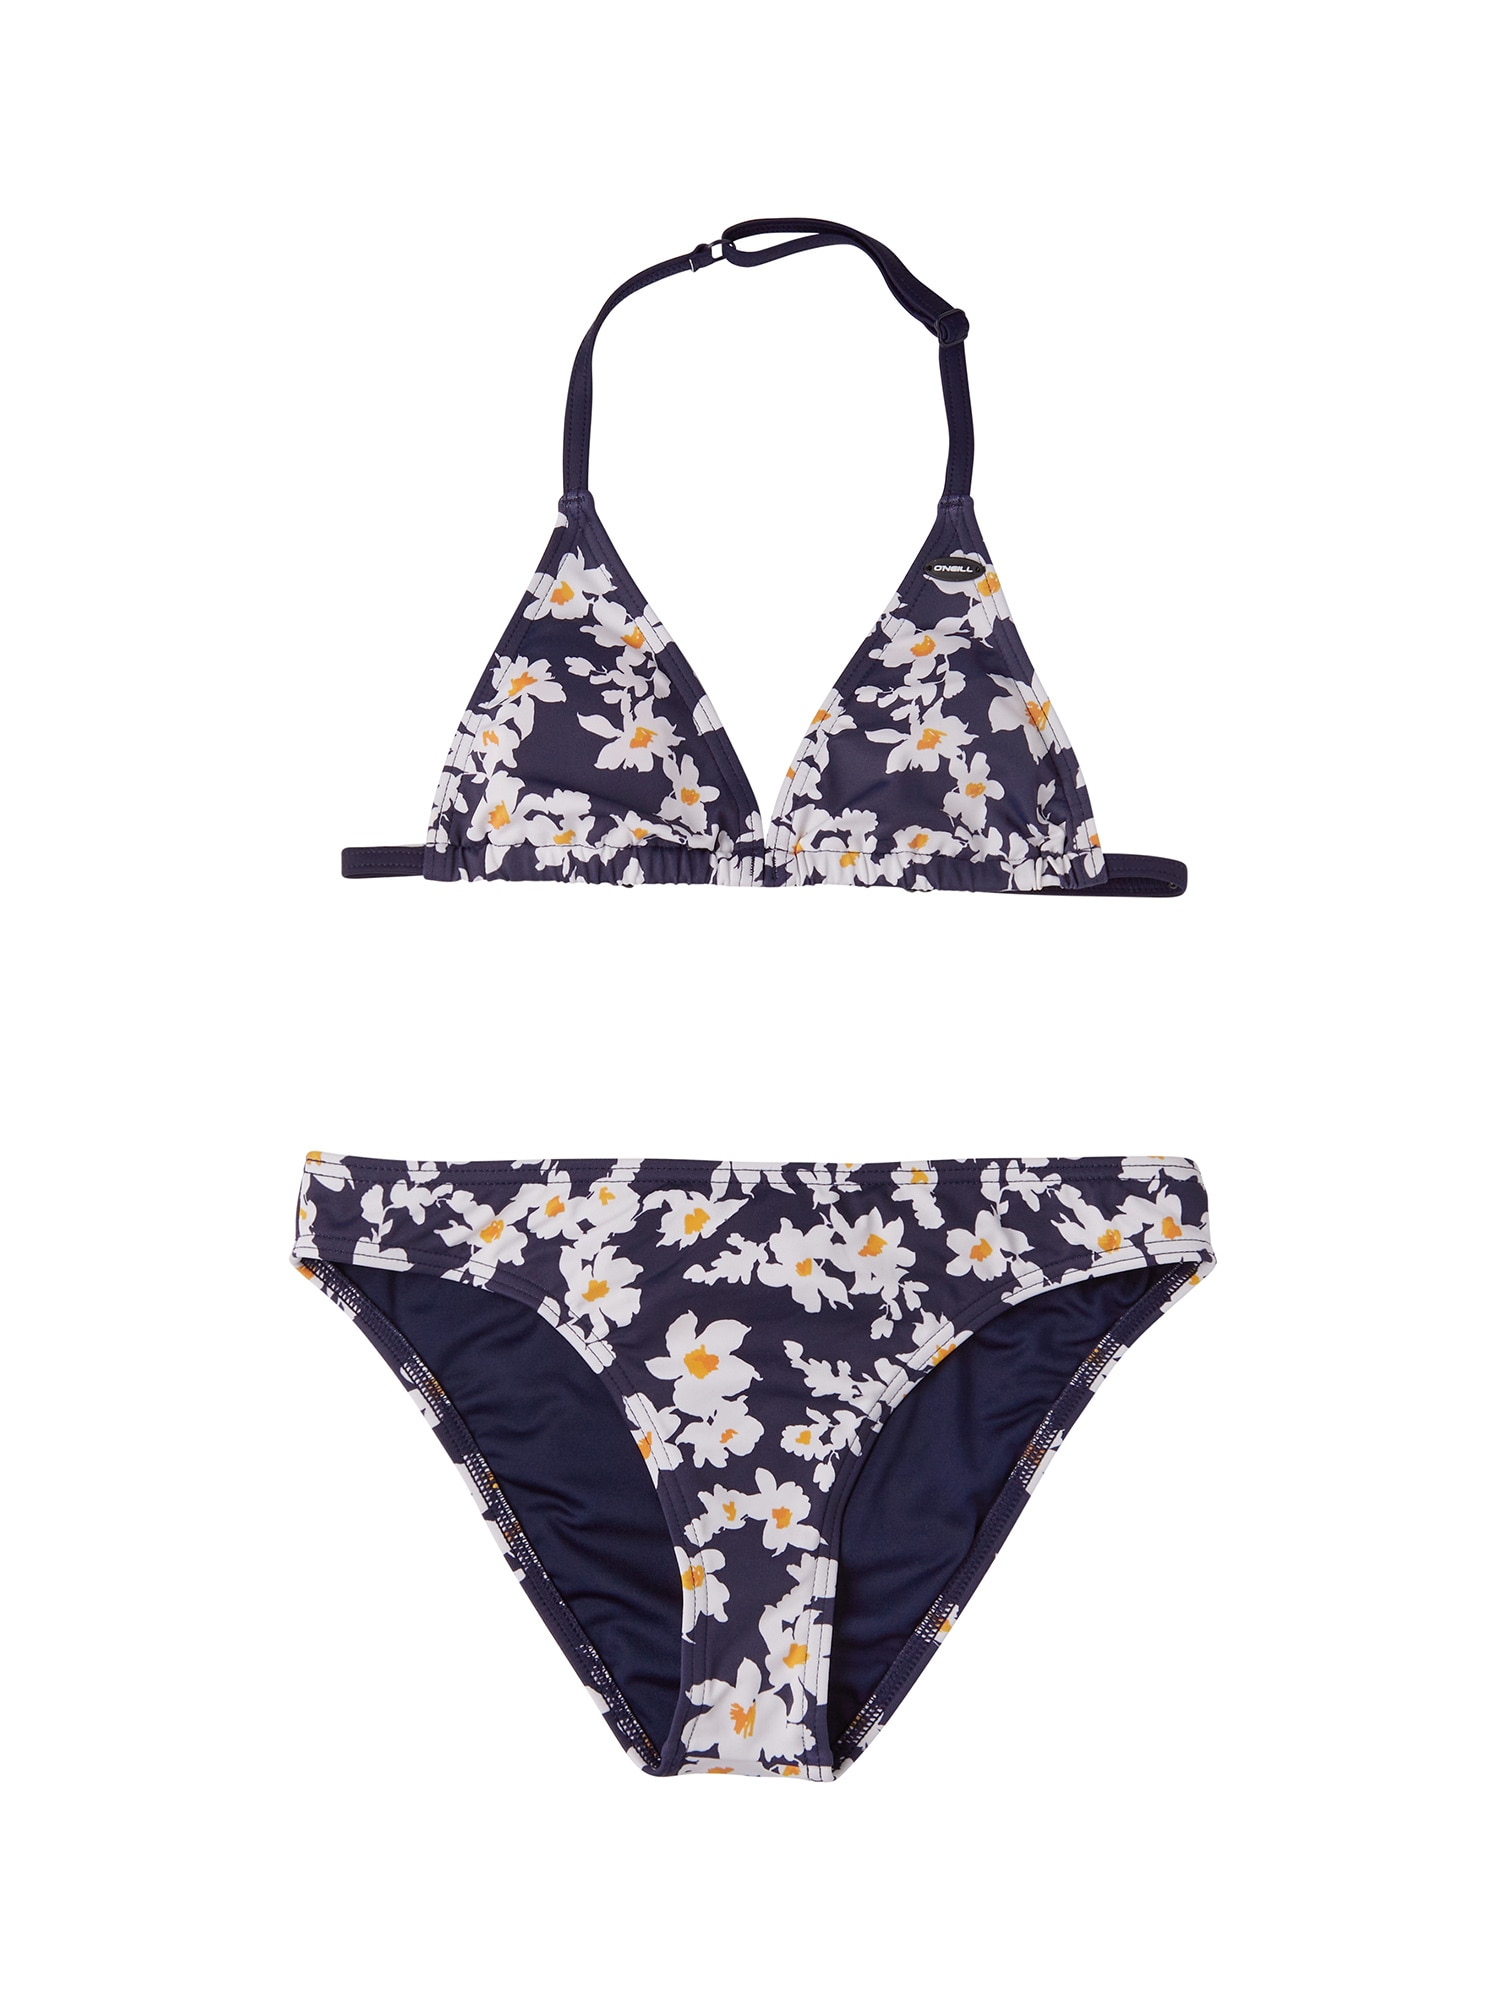 O'NEILL Bikinis 'Venice Beach Party' tamsiai mėlyna / balta / geltona